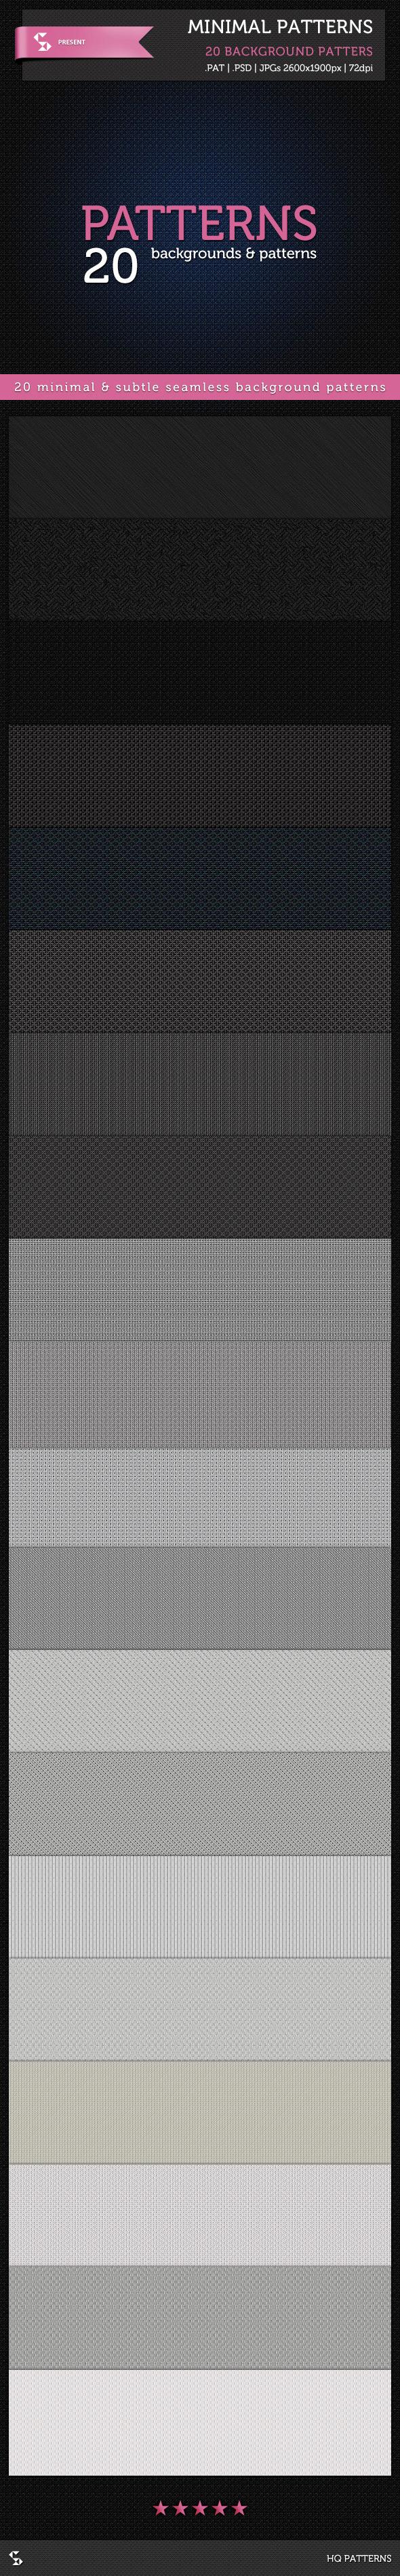 20 Minimal Patterns Subtle Background Patterns